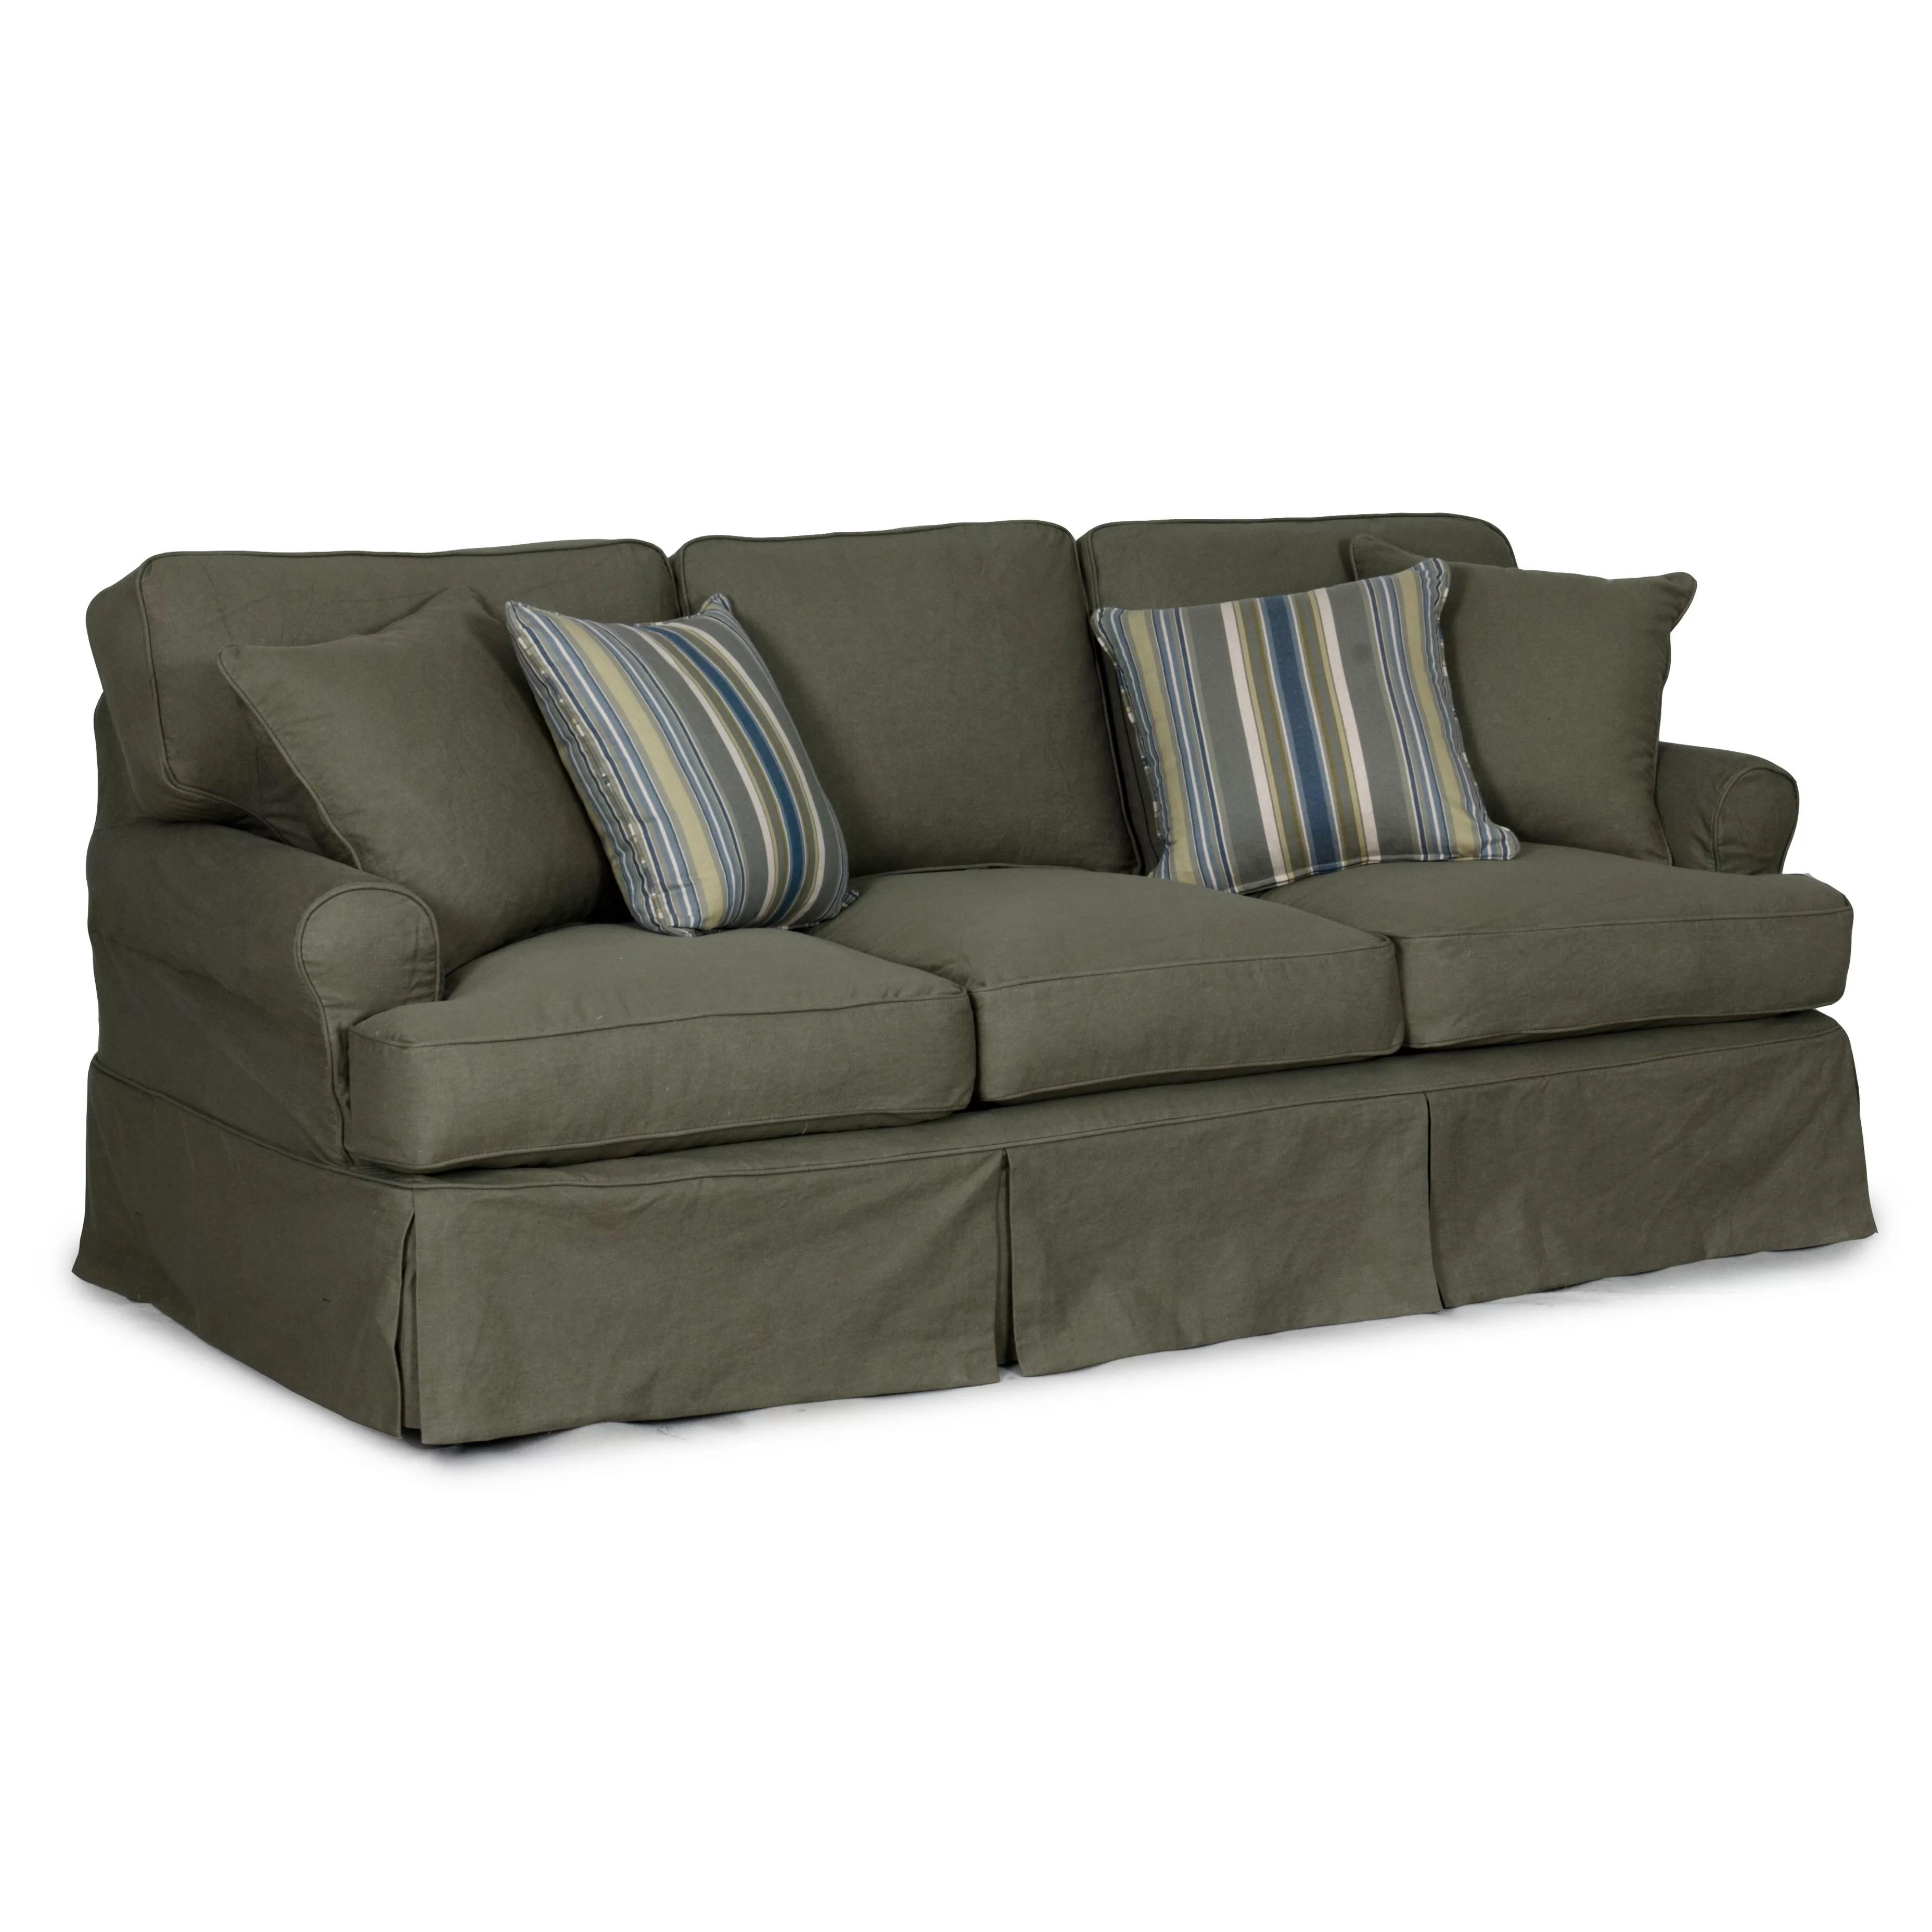 cushion sofa set bed bobs furniture sunset trading horizon t slipcover